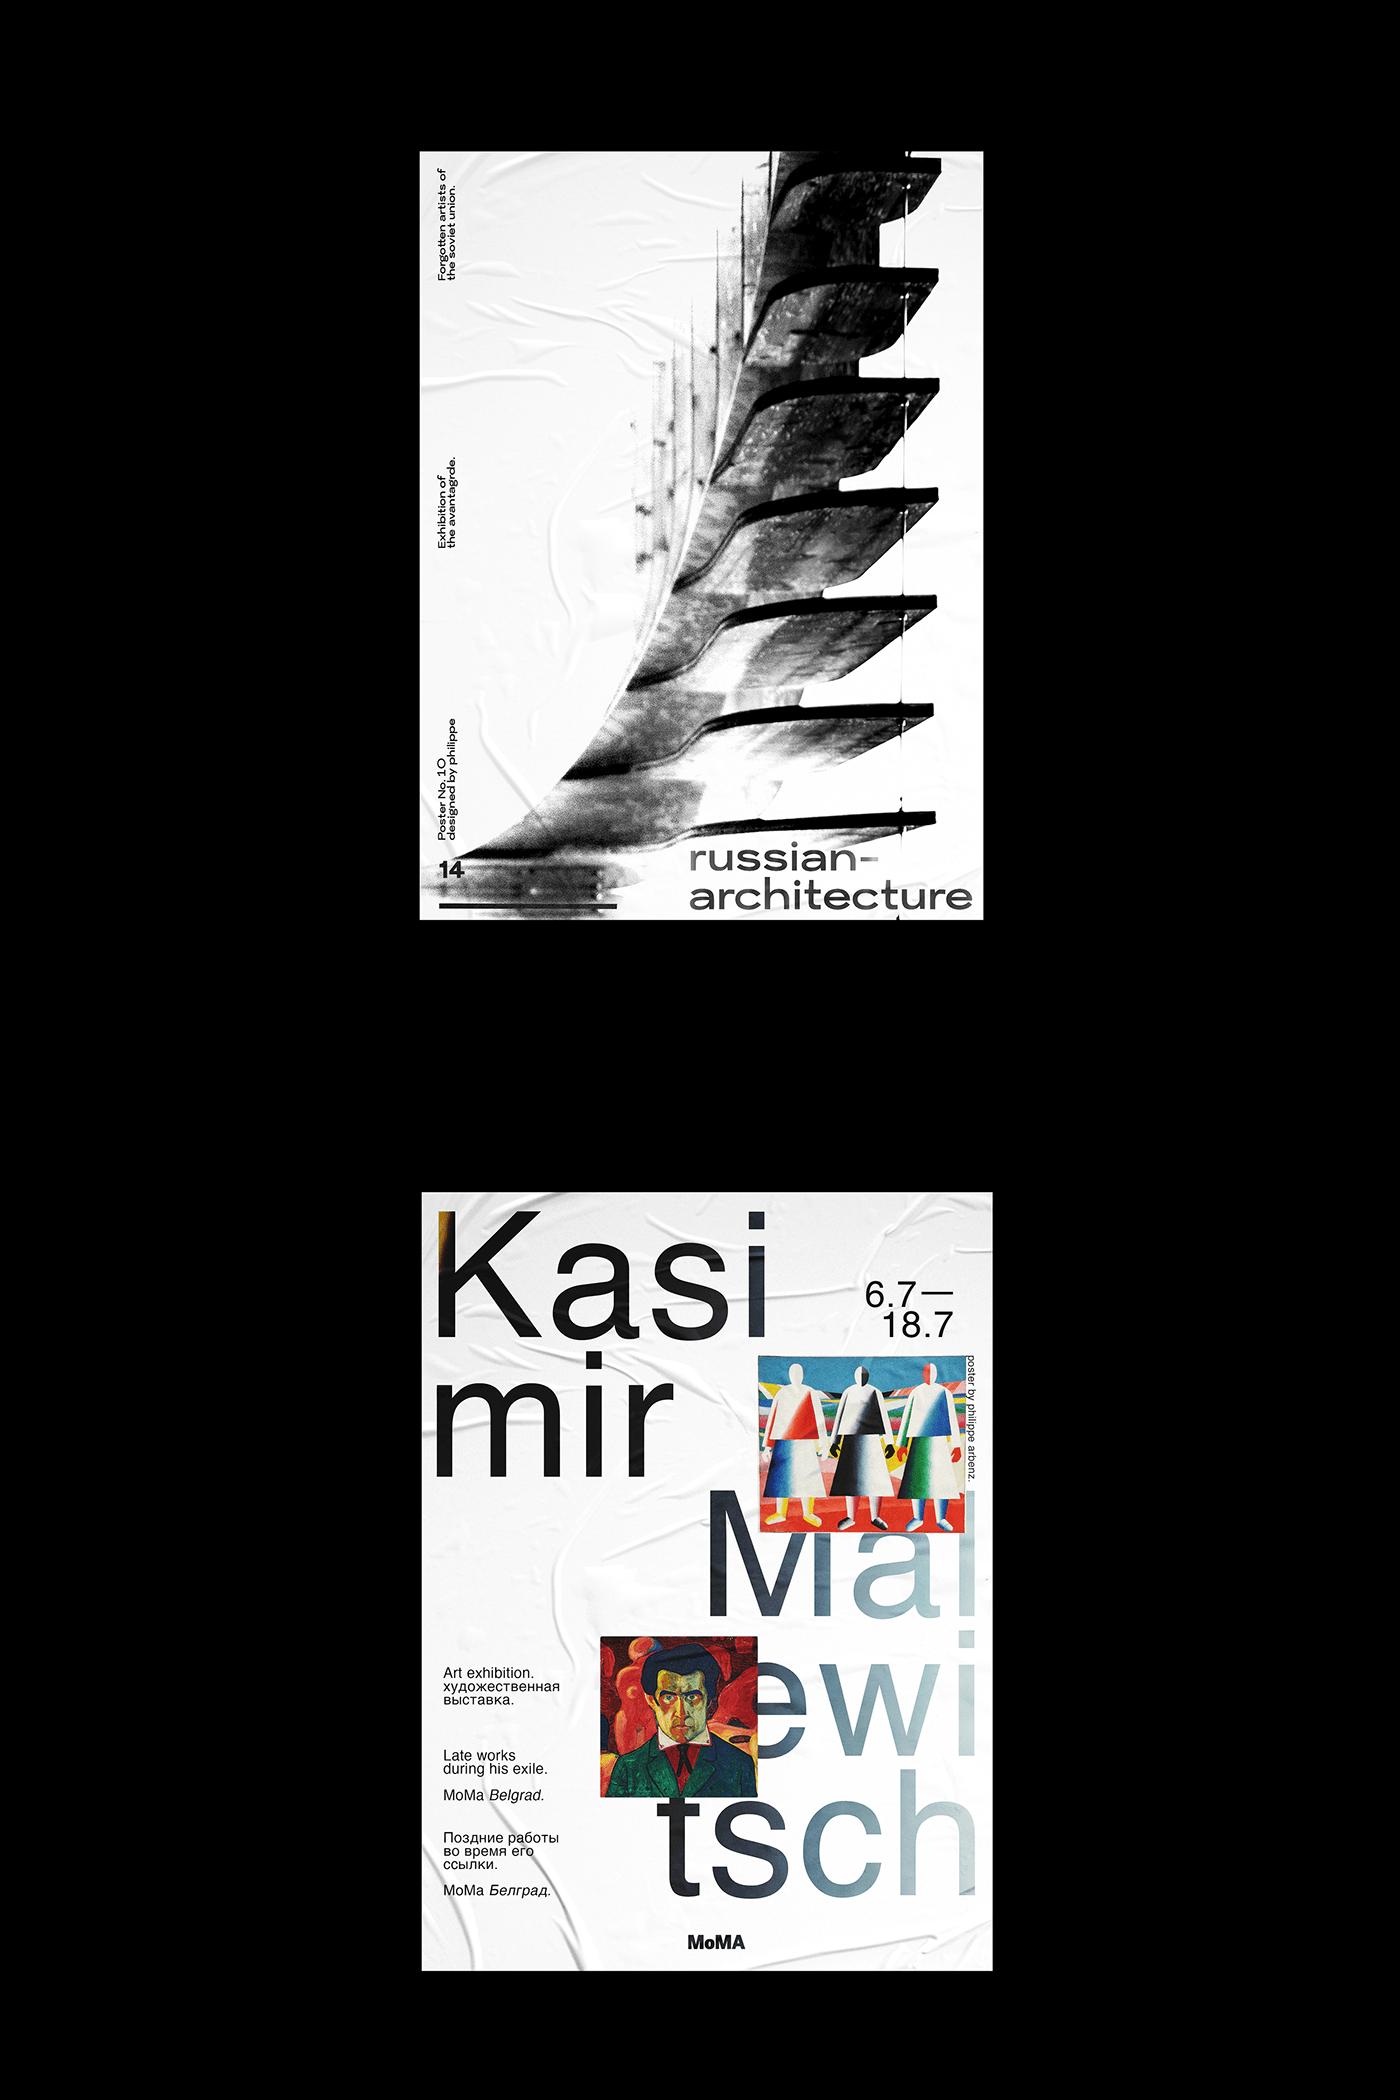 poster swiss modern helvetica neue grotesque avantgarde everyday Exhibition  Kunsthaus